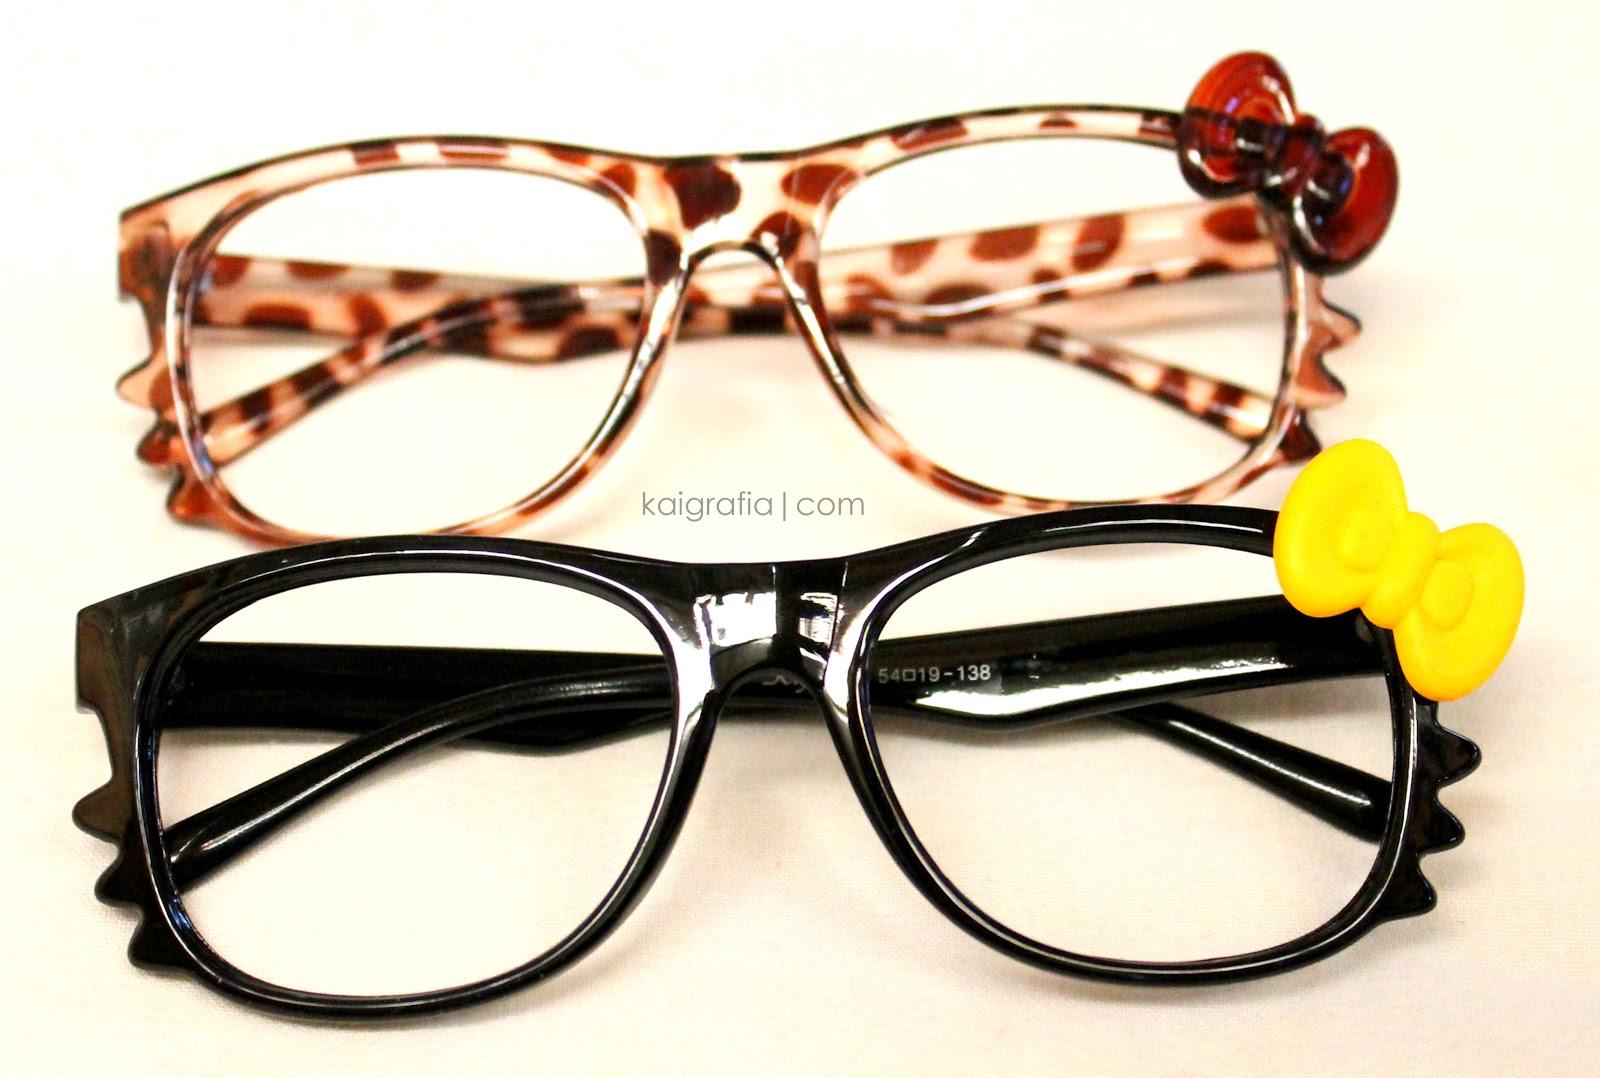 HK Glasses